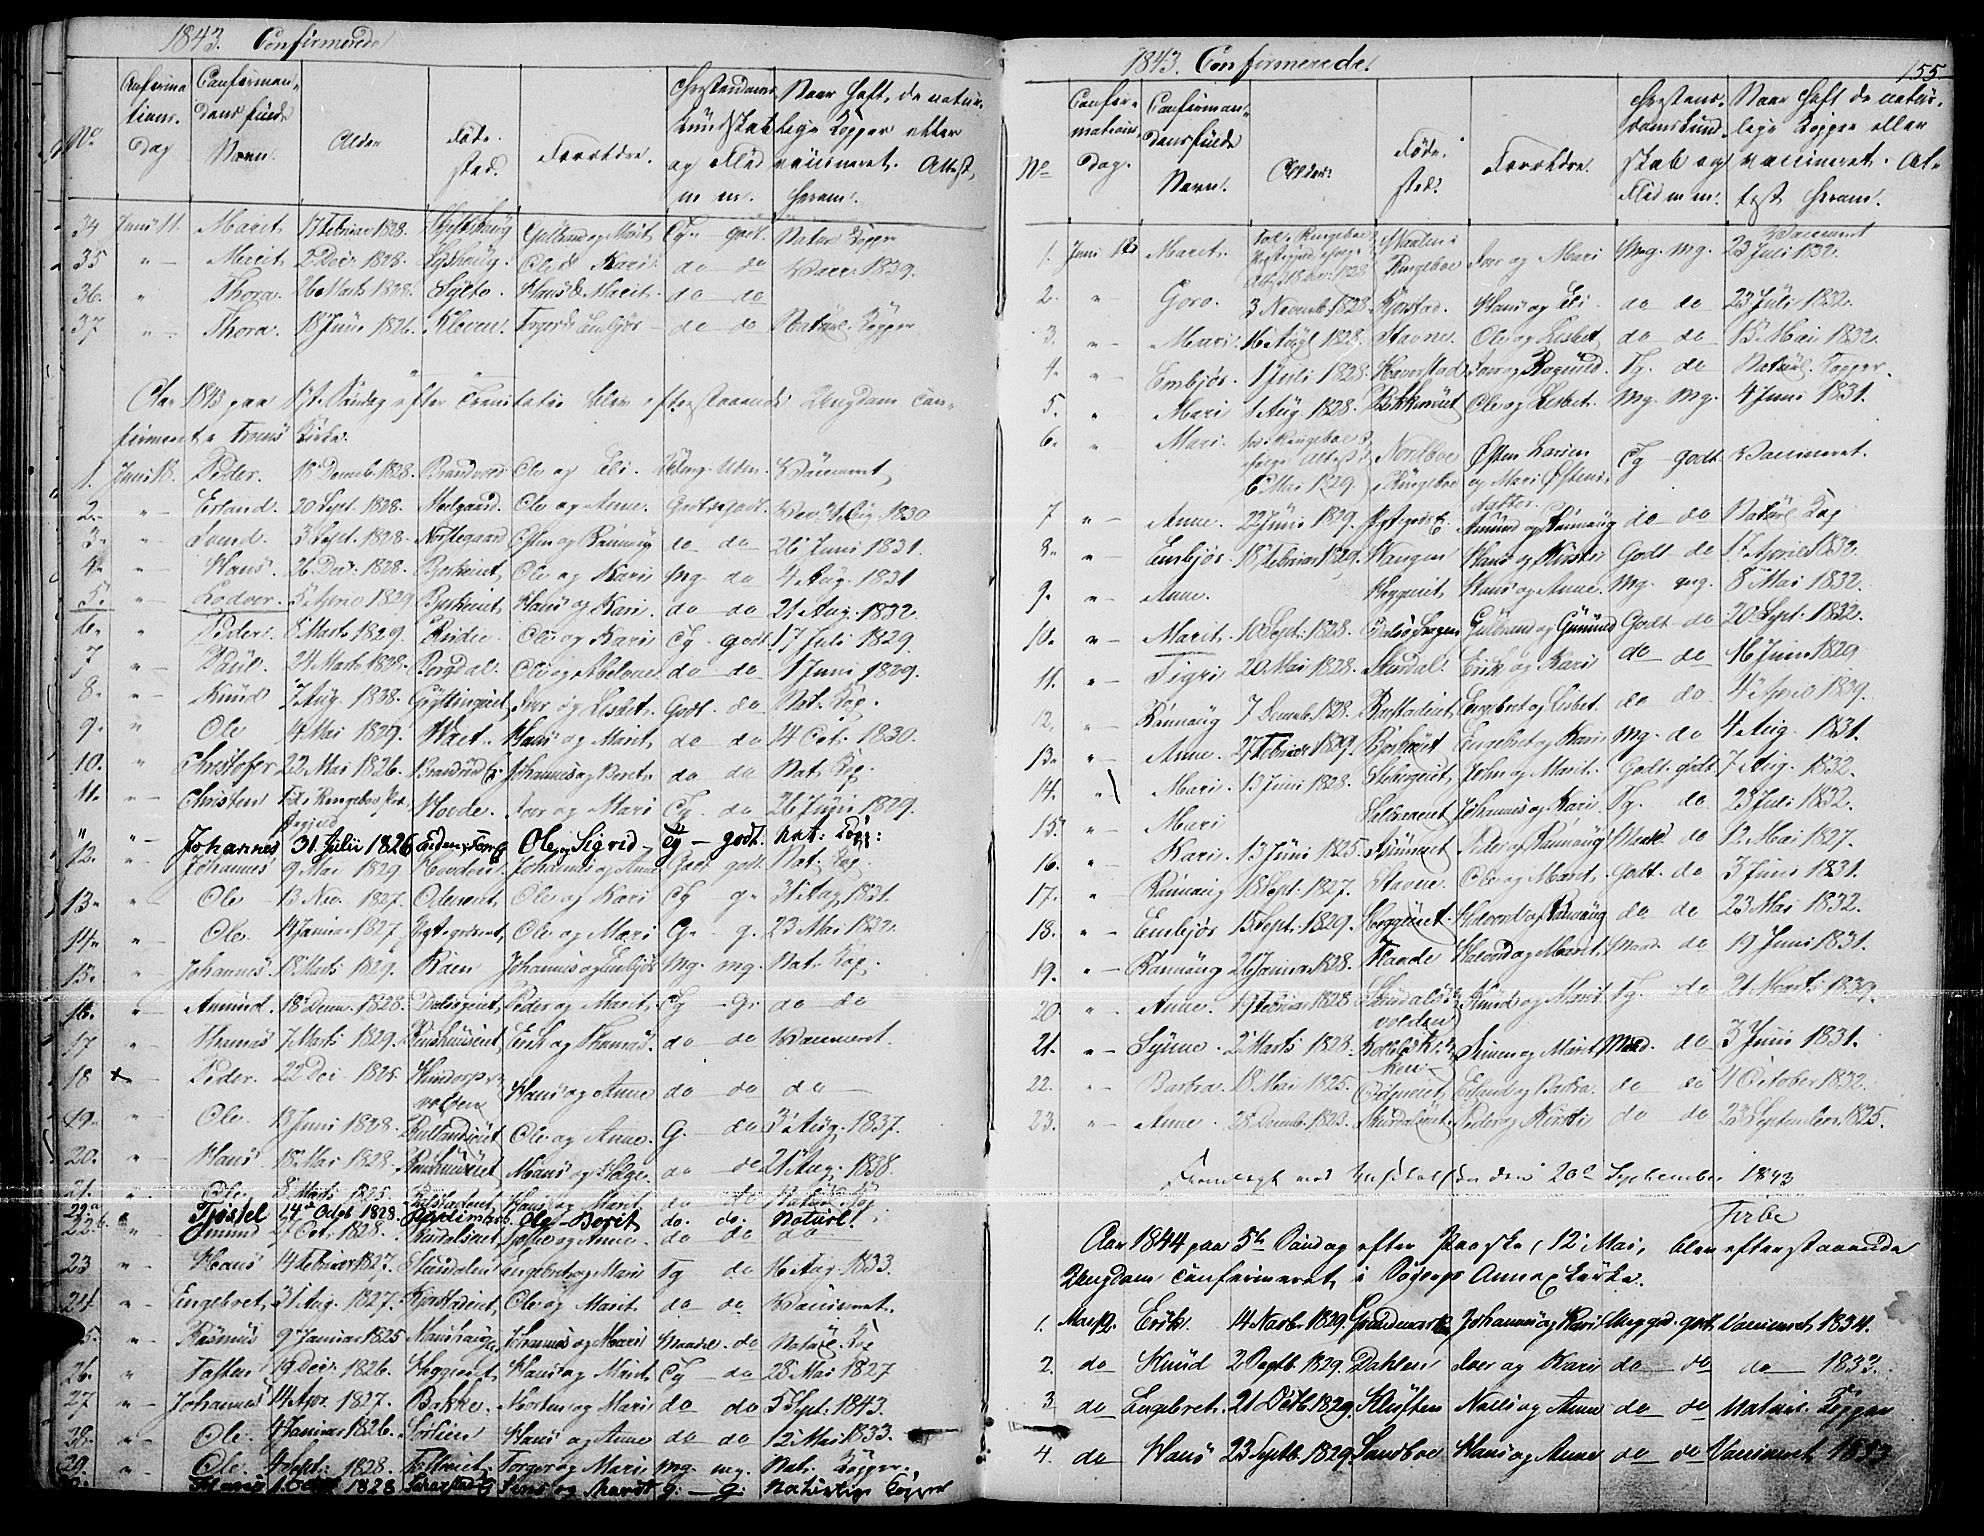 SAH, Fron prestekontor, H/Ha/Haa/L0004: Ministerialbok nr. 4, 1839-1848, s. 155